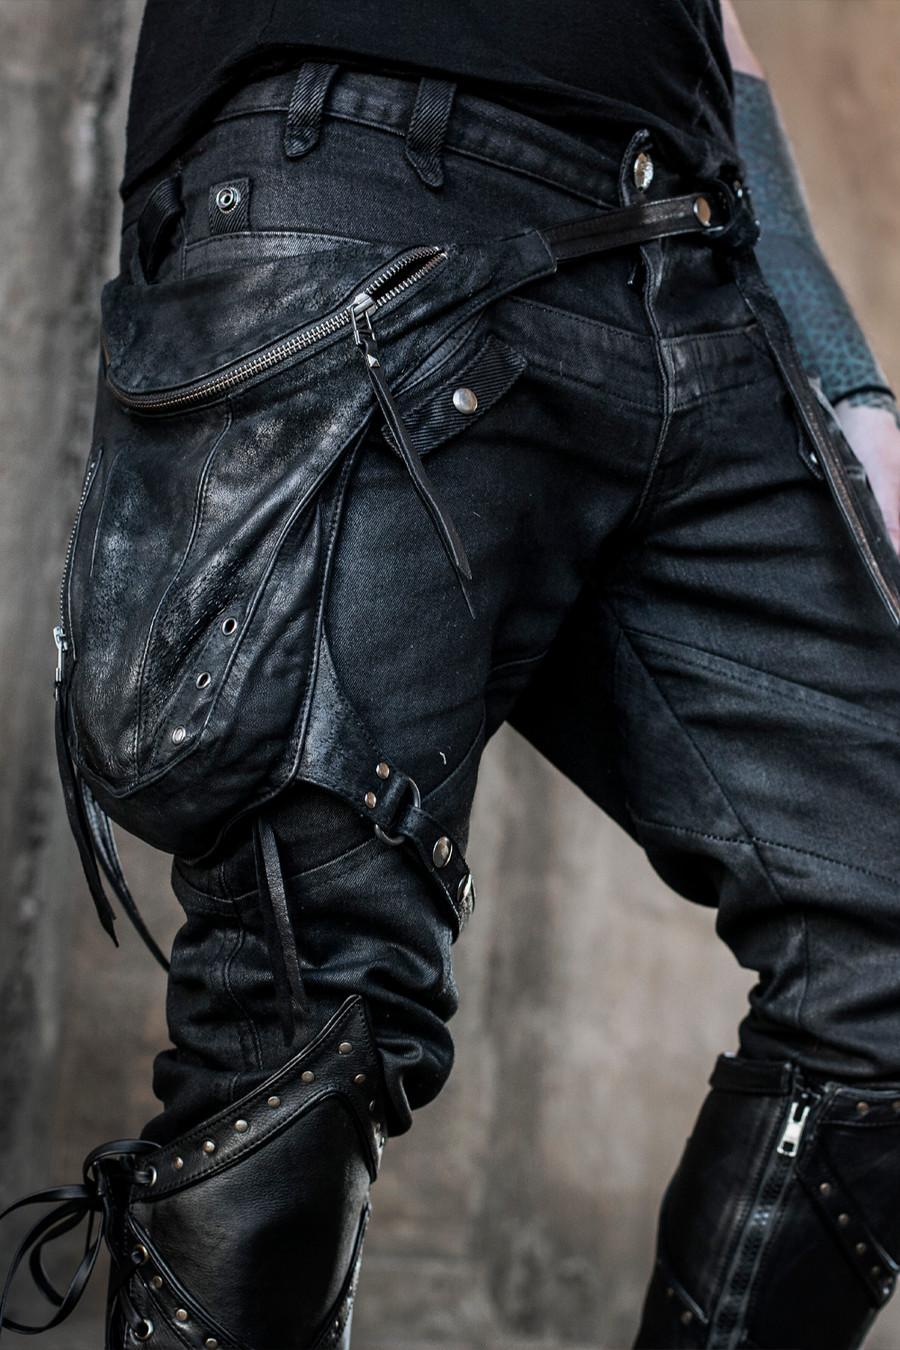 Valiant Leather Hip Stash